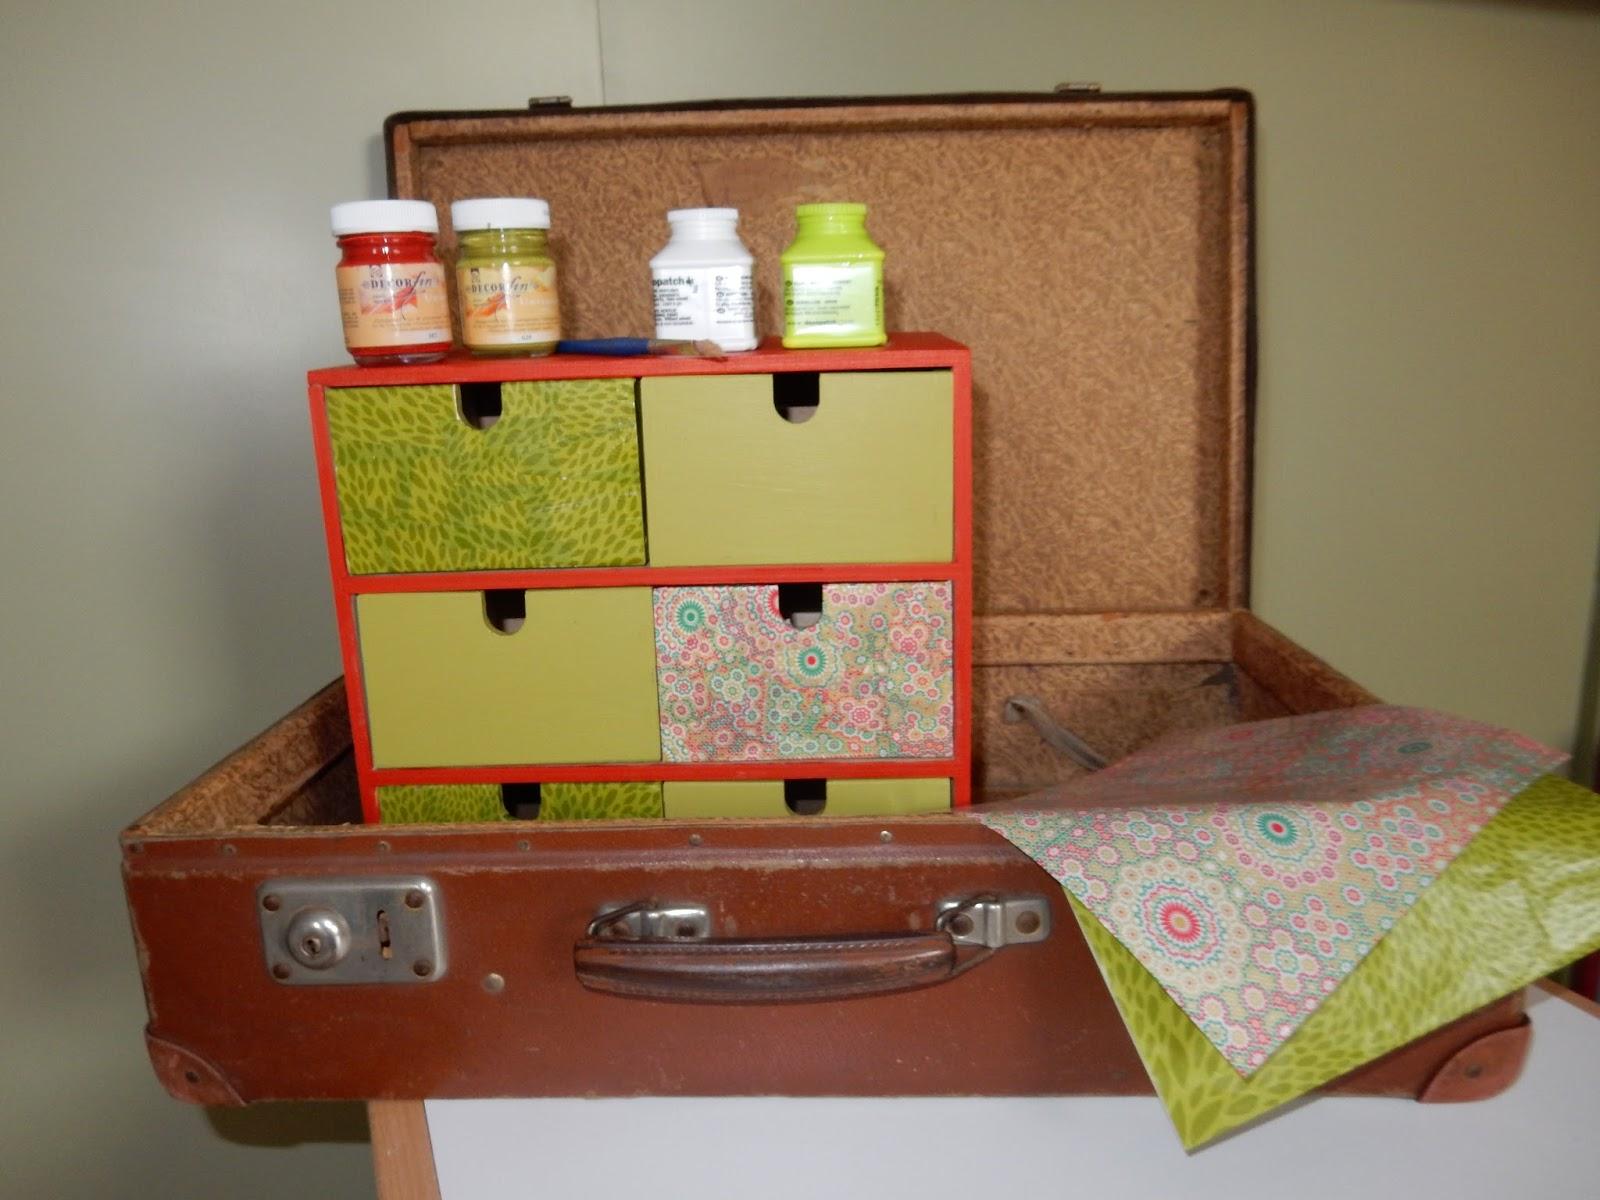 les petites valises petite valise d co la petite. Black Bedroom Furniture Sets. Home Design Ideas